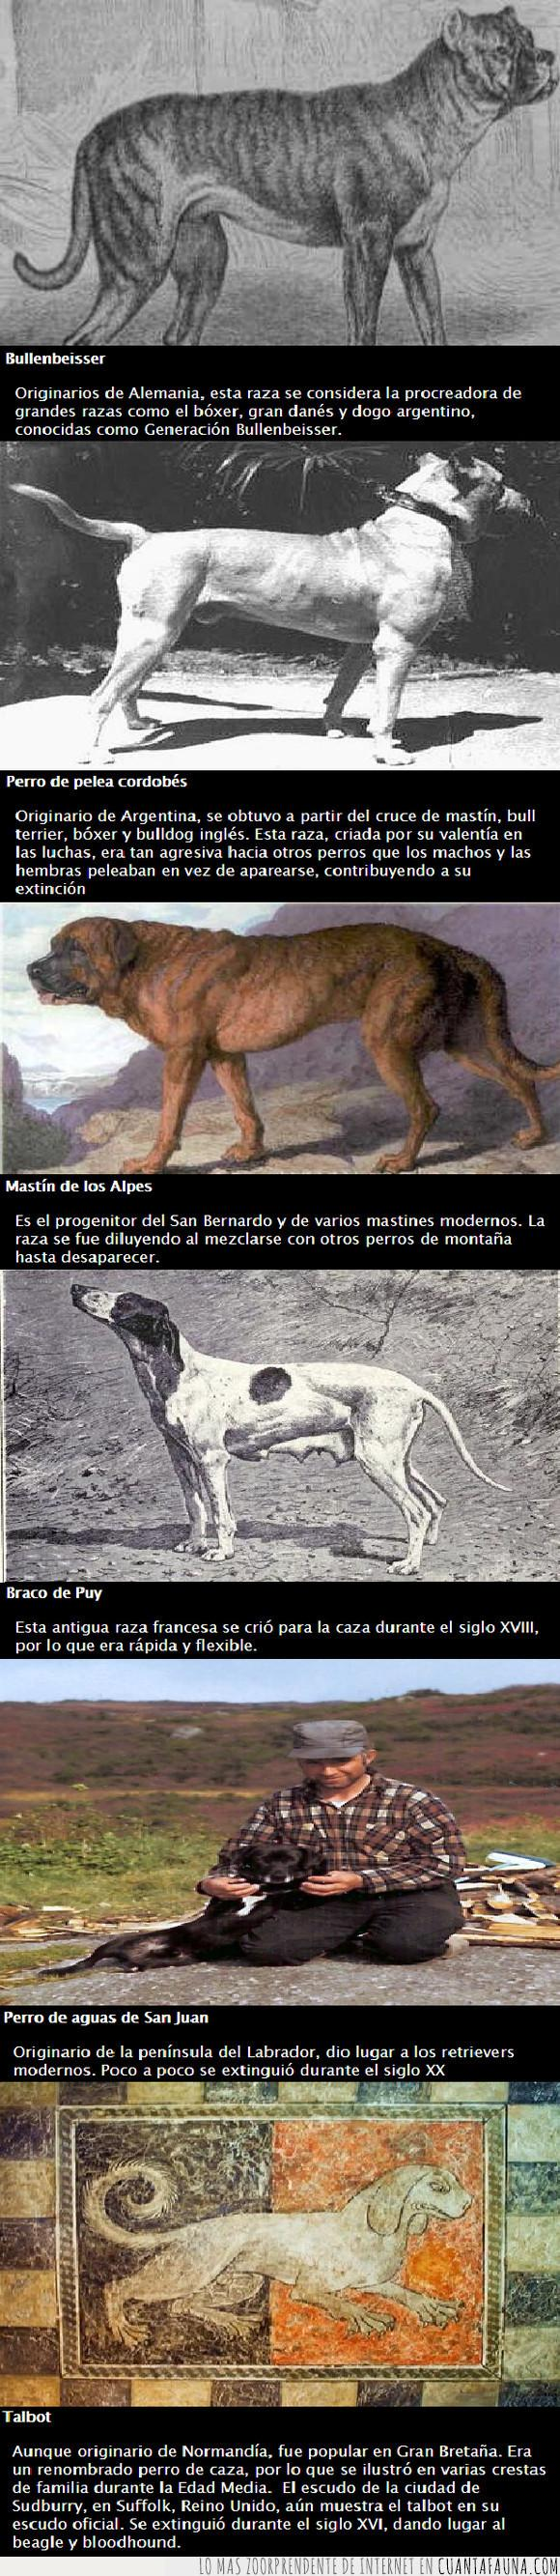 braco de puy,bullenbeisser,extintos,perro de aguas de San Juan,perro de pelea cordobés,perros,talbot